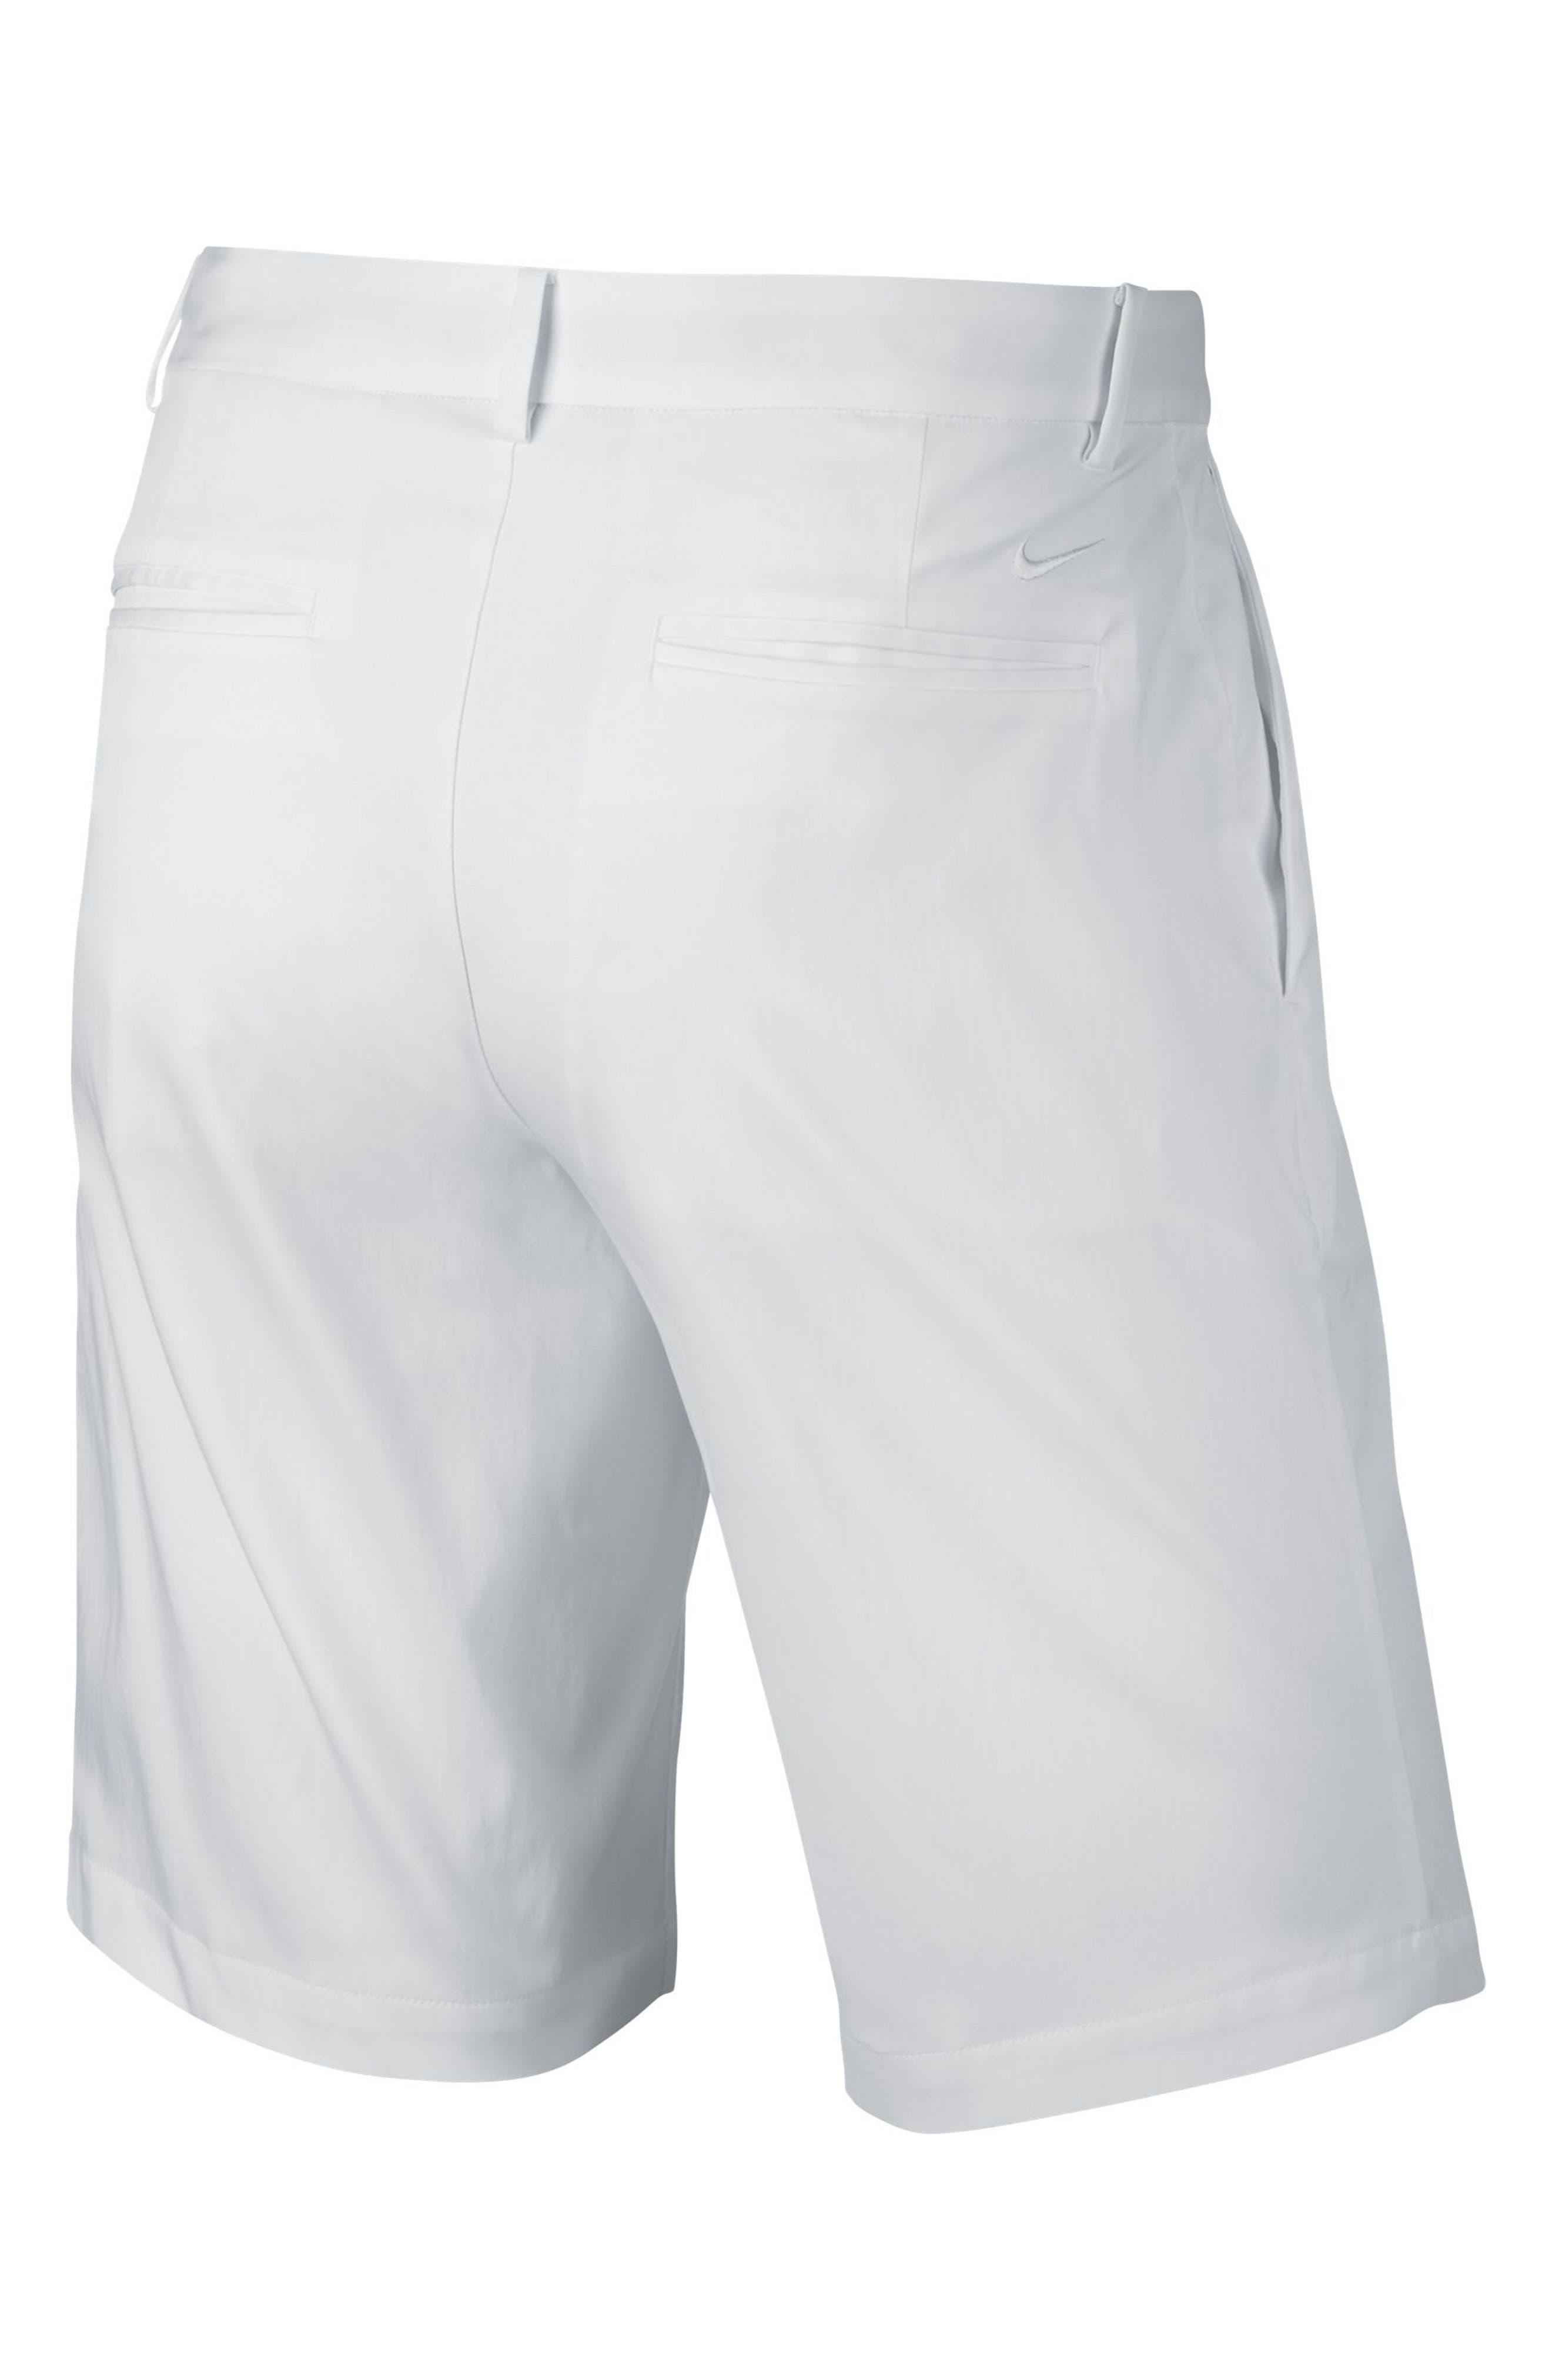 Flat Front Golf Shorts,                             Alternate thumbnail 65, color,